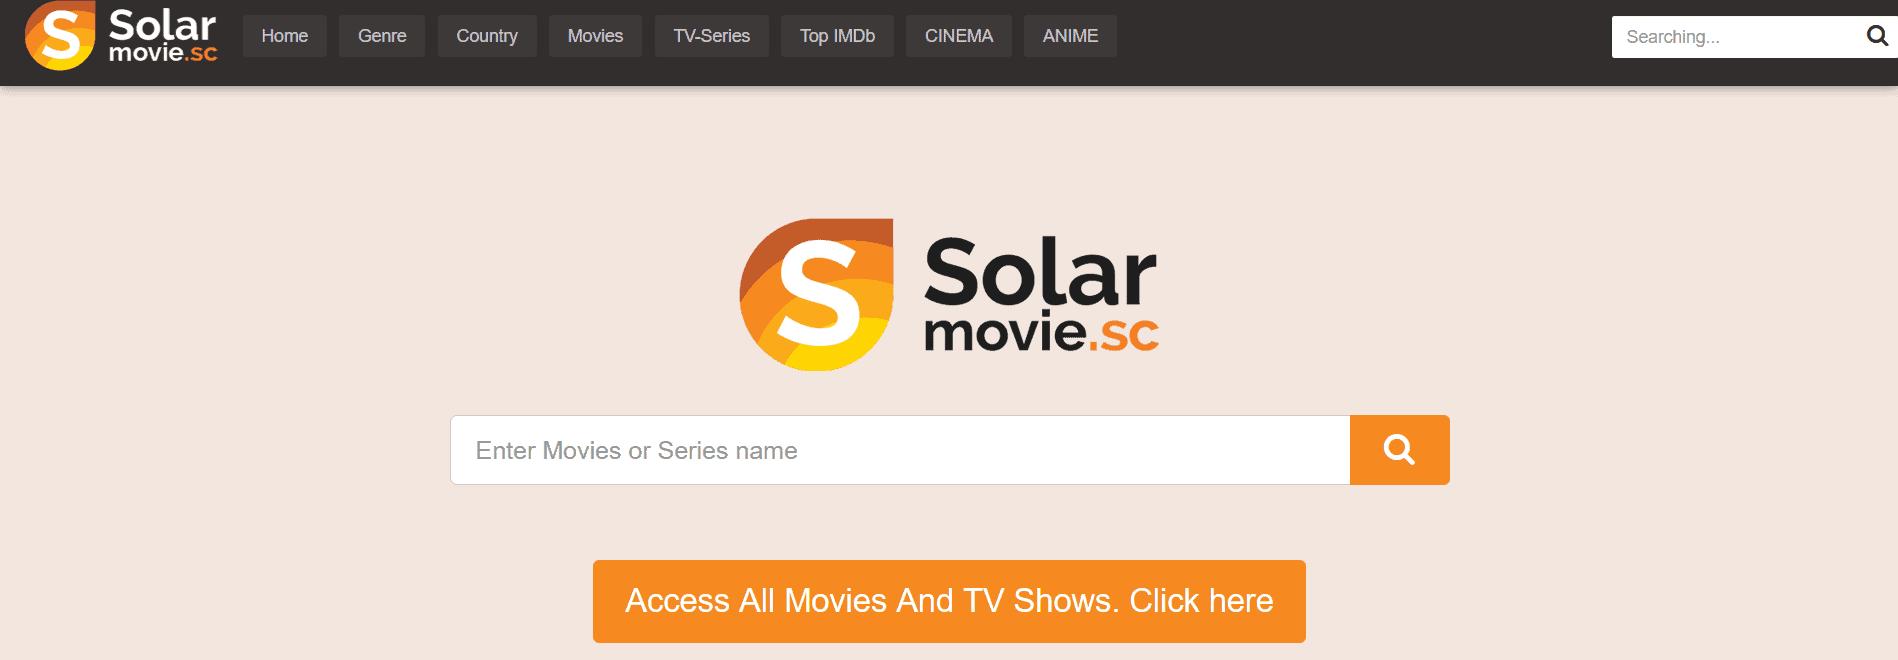 SolarMovie es una alternativa a TheWatchSeries